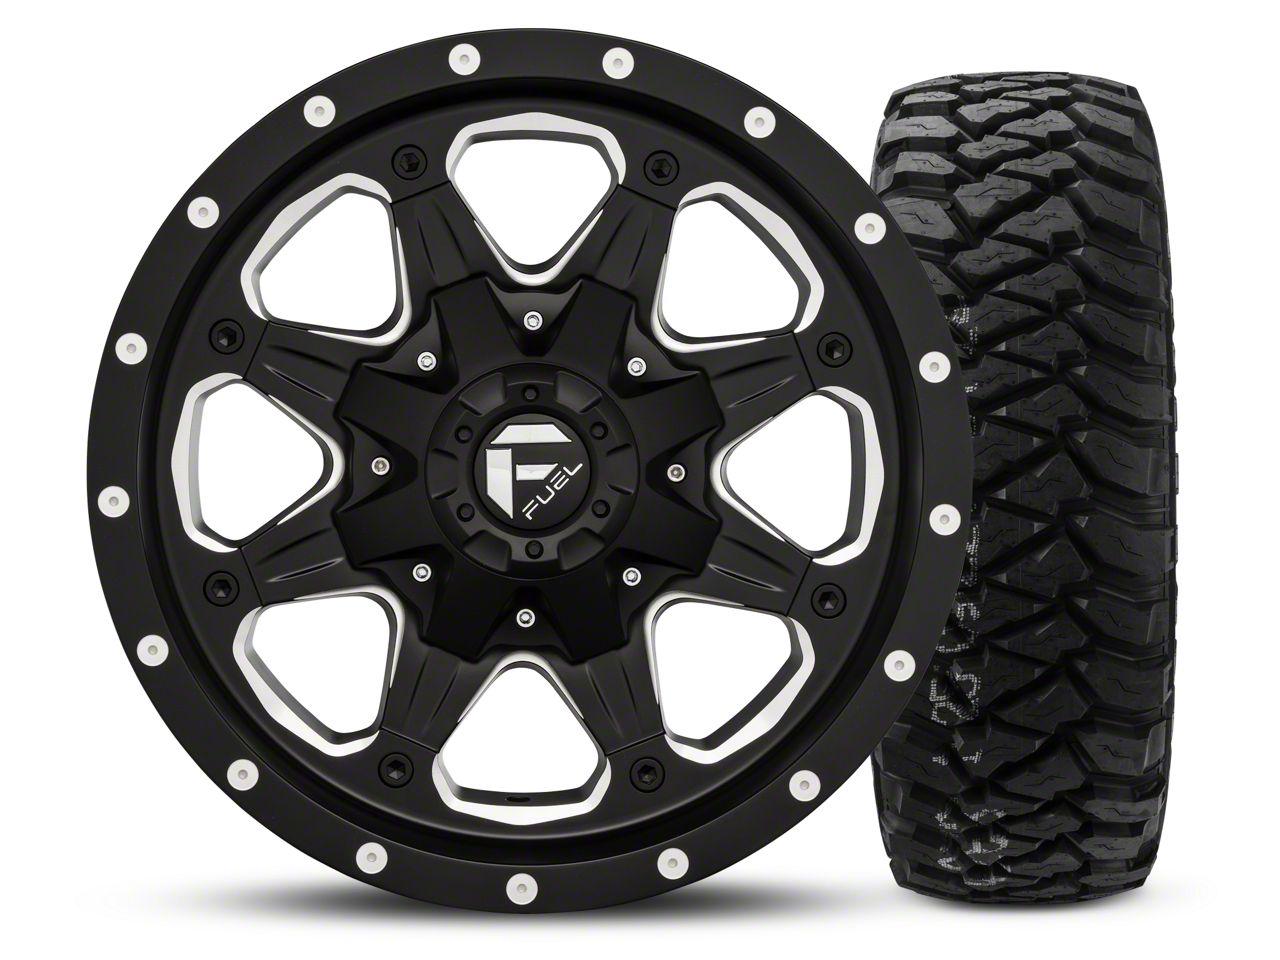 Fuel Wheels Boost - Black/Milled 16x8 Wheel - and Mickey Thompson Baja MTZP3 Tire - 285/75R16 (07-18 Jeep Wrangler JK; 2018 Jeep Wrangler JL)